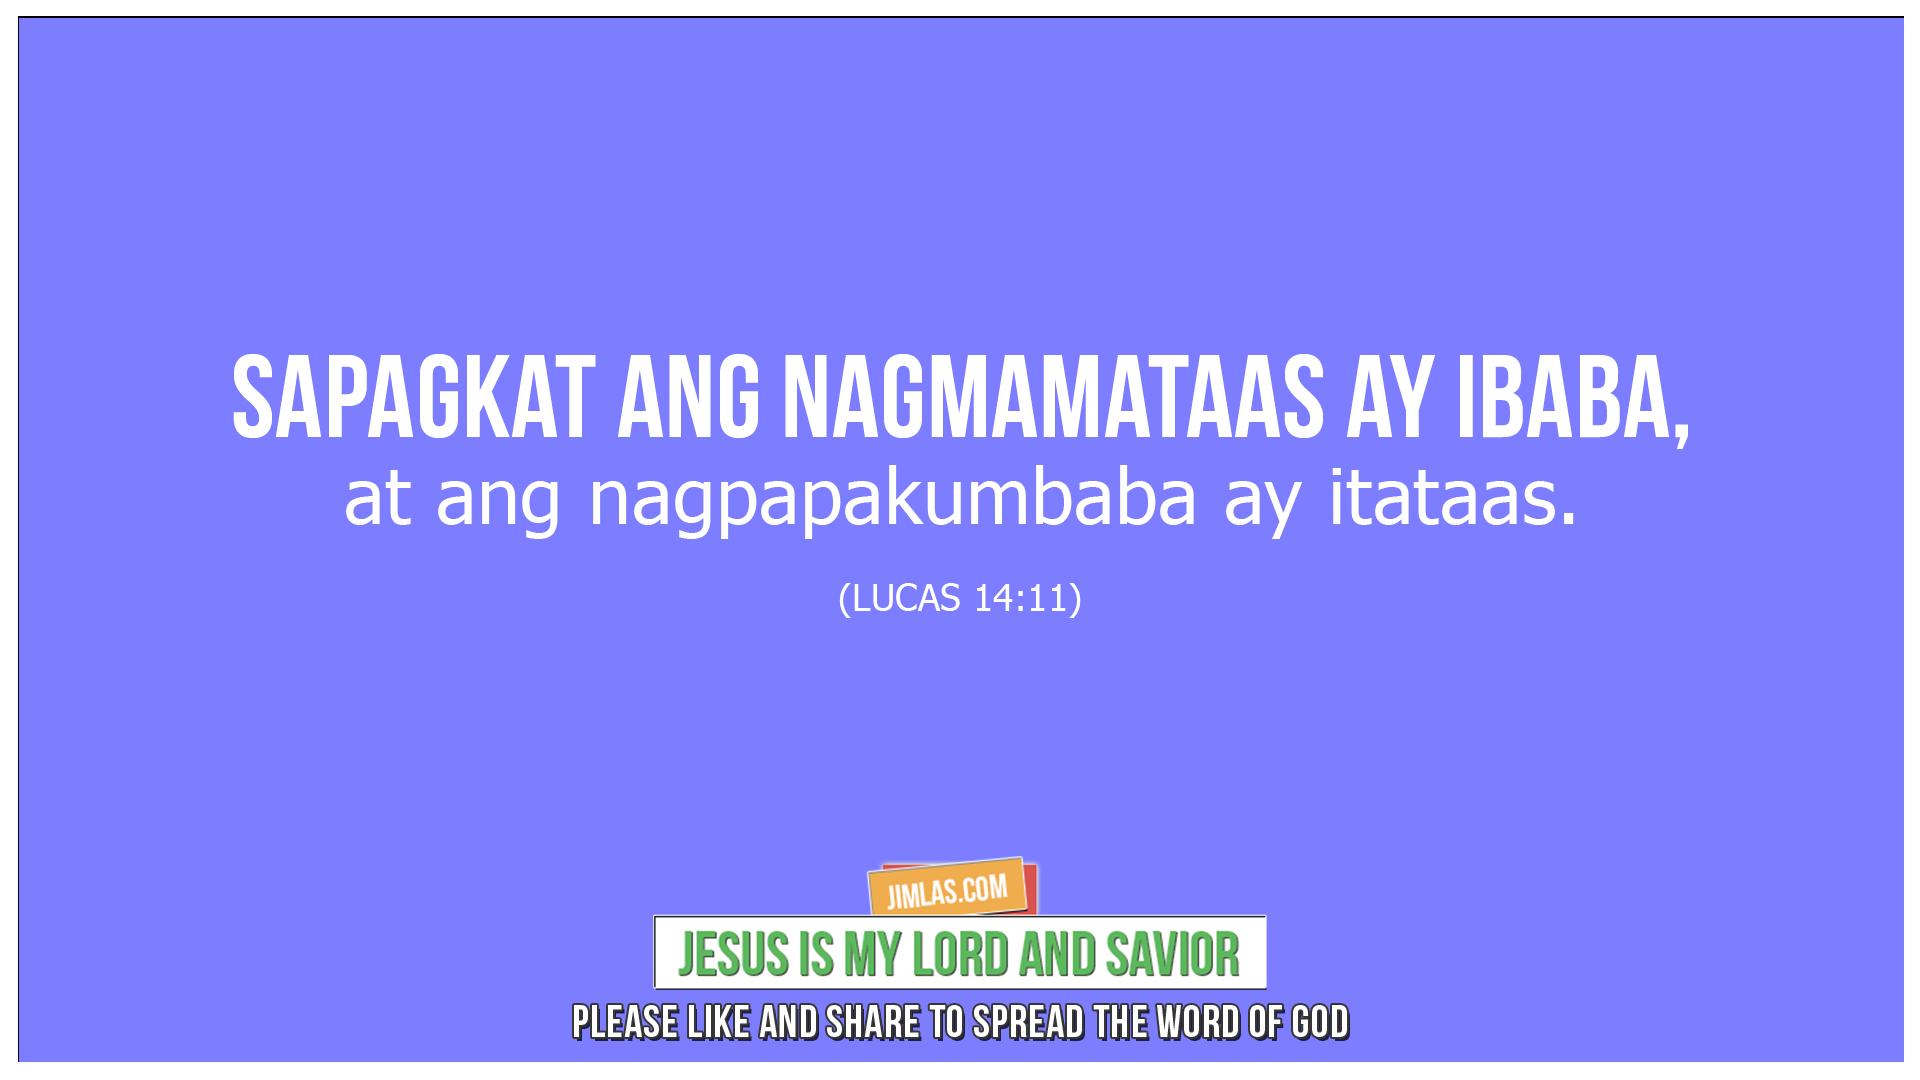 lucas 14:11, Lucas 14:11